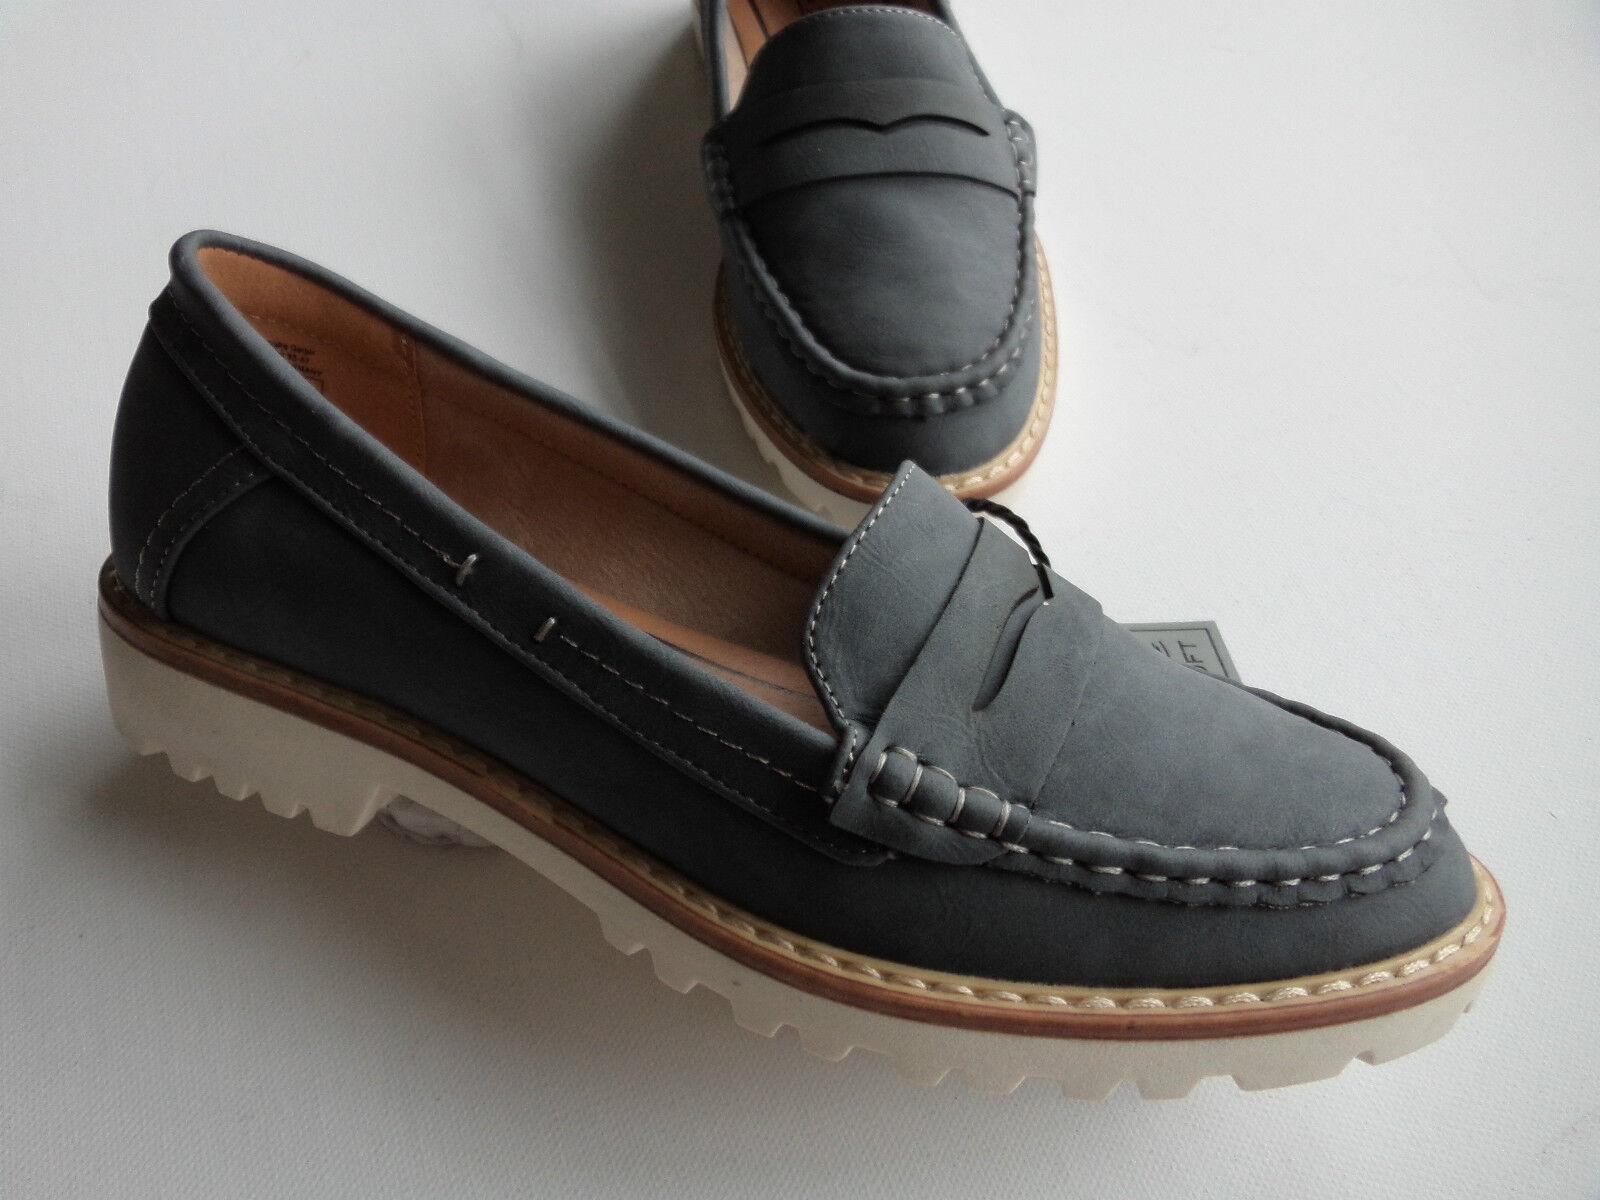 NEU  Jane  Klain  Bootsschuh Slipper  jeansblue Wildlederoptik  Größe  36 - 41